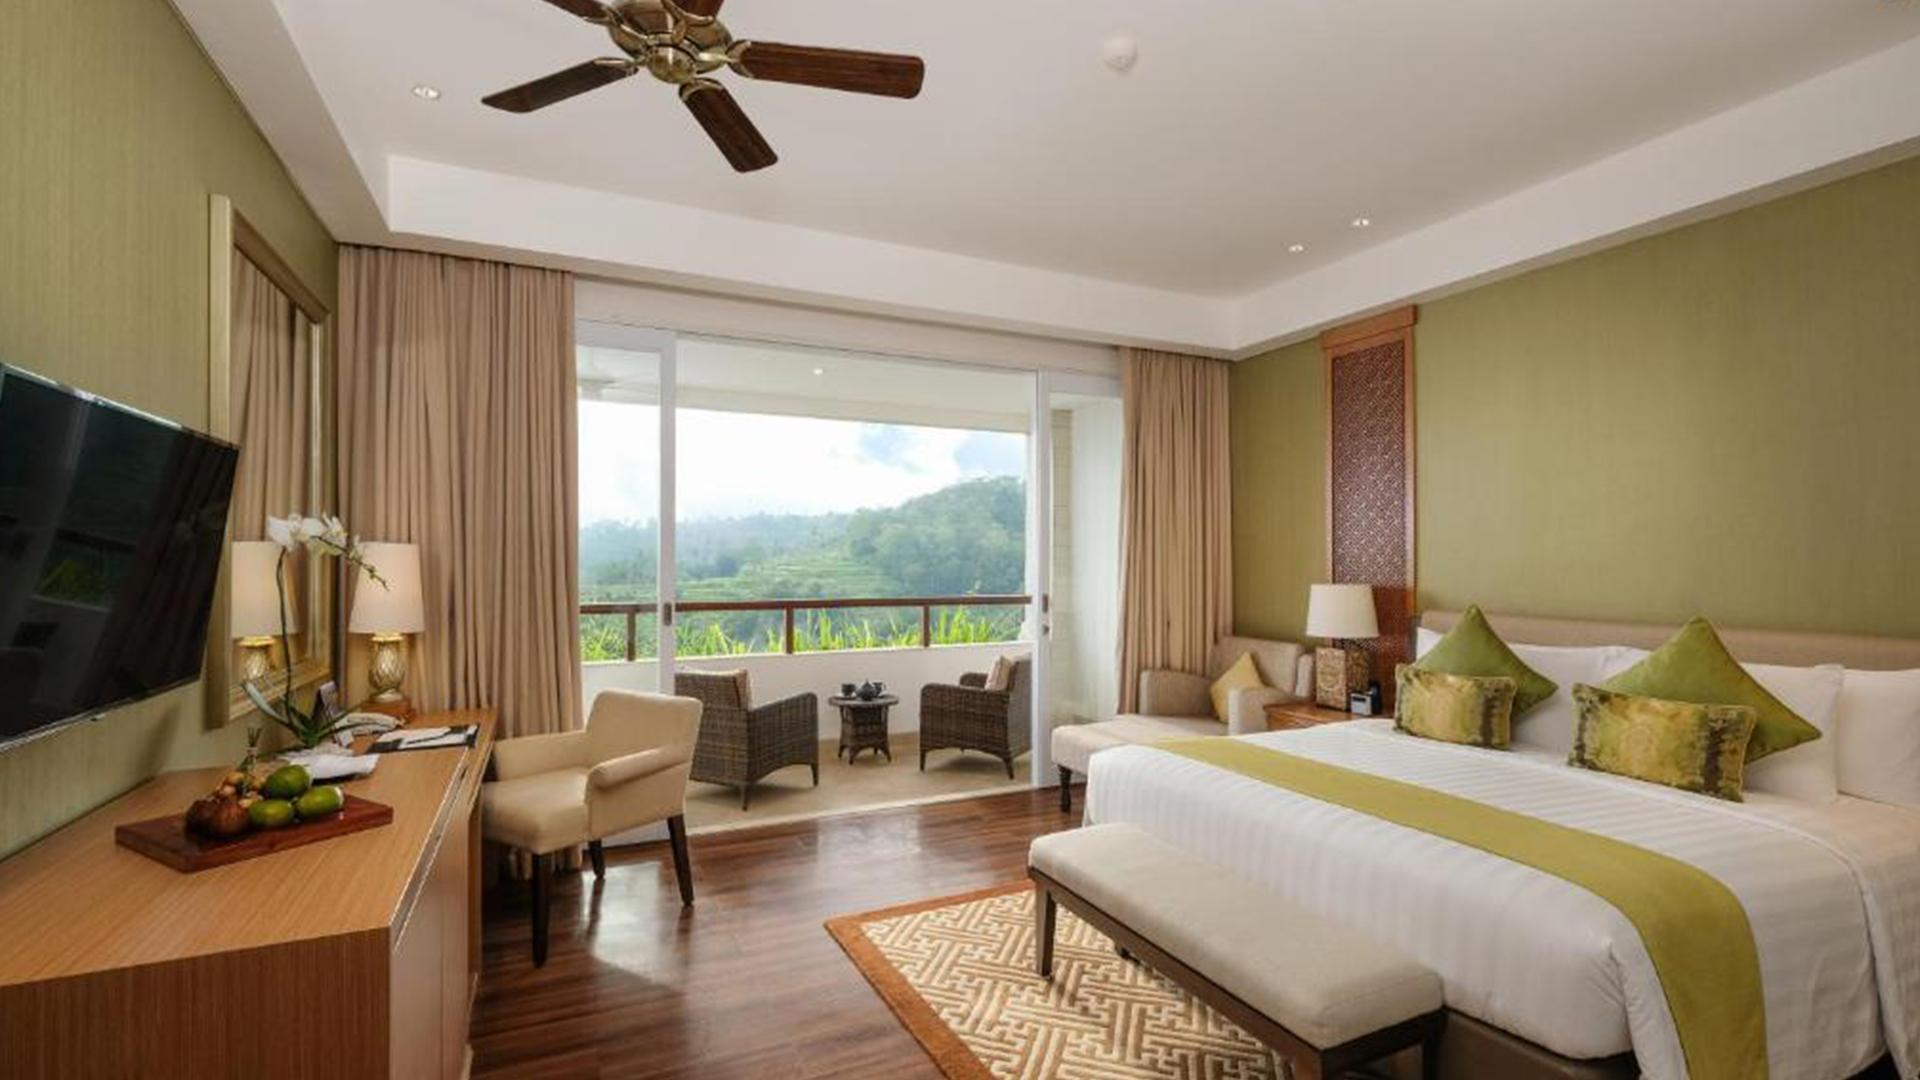 Deluxe Room image 1 at Saranam Resort & Spa* by Kabupaten Tabanan, Bali, Indonesia